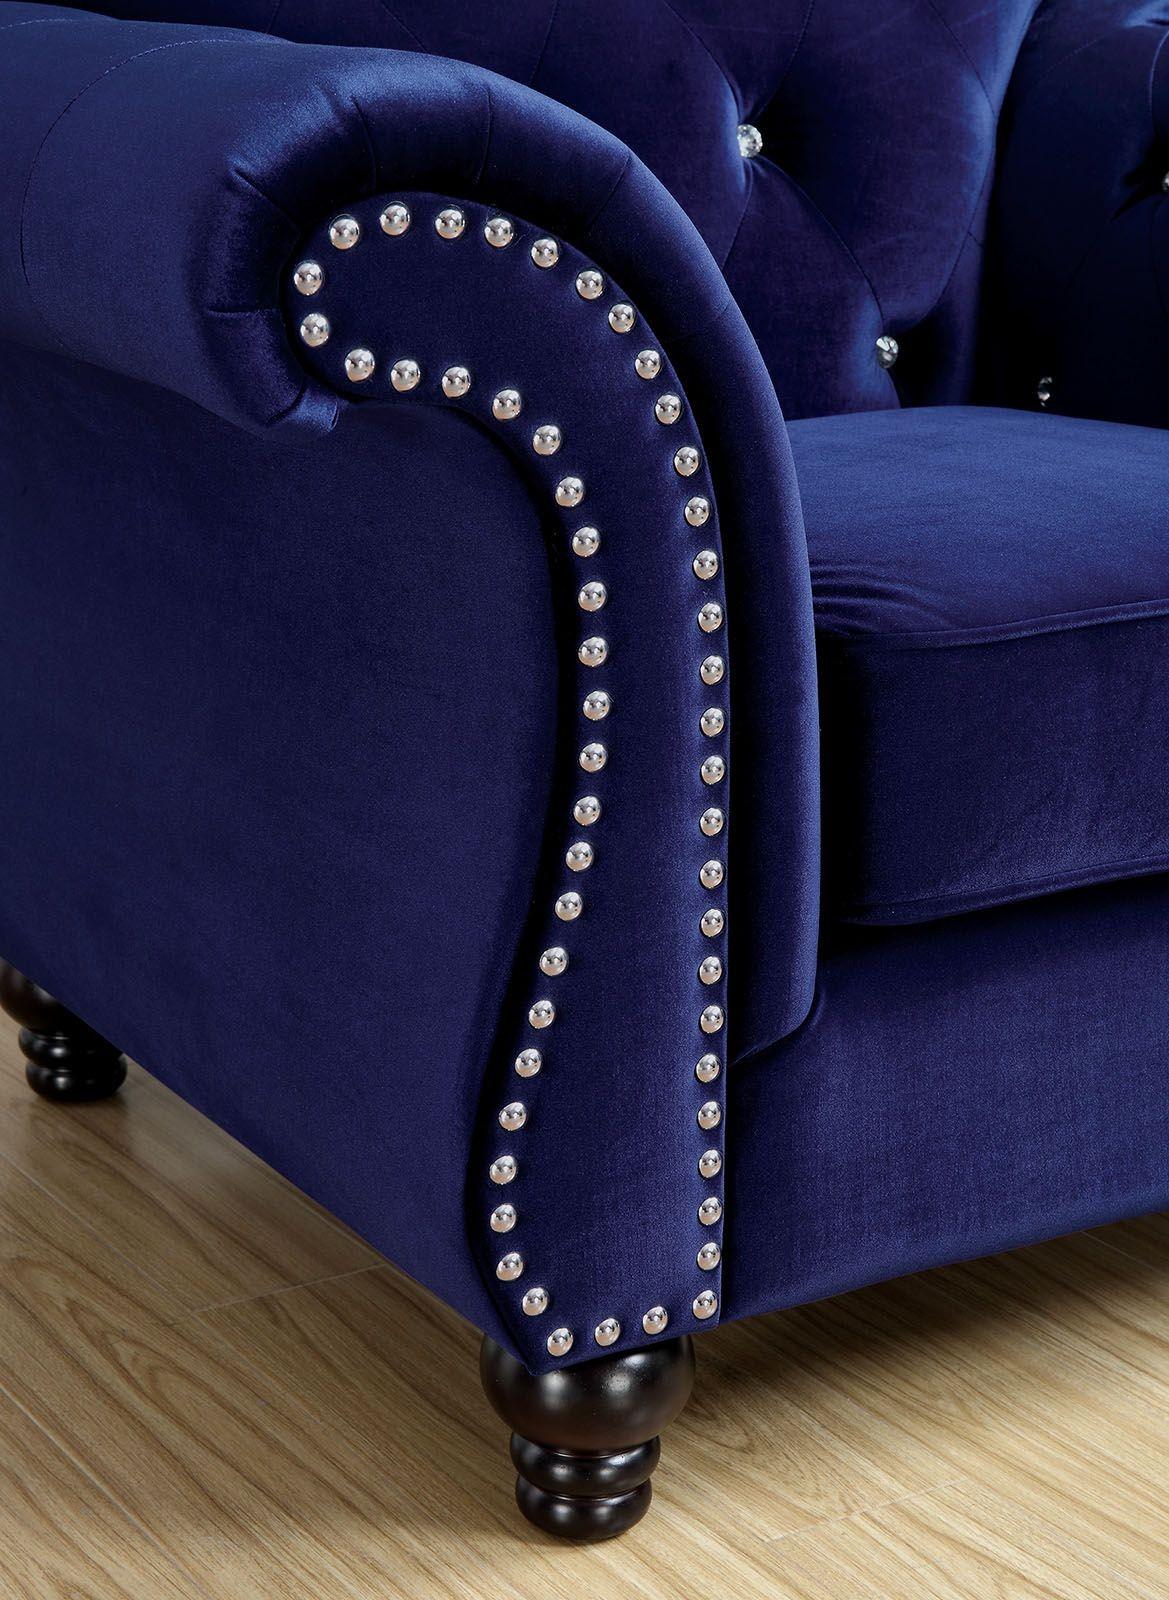 Clarke Fabric Sectional Sofa Living Room: Jolanda Blue Flannelette Fabric Sofa, CM6159BL-SF